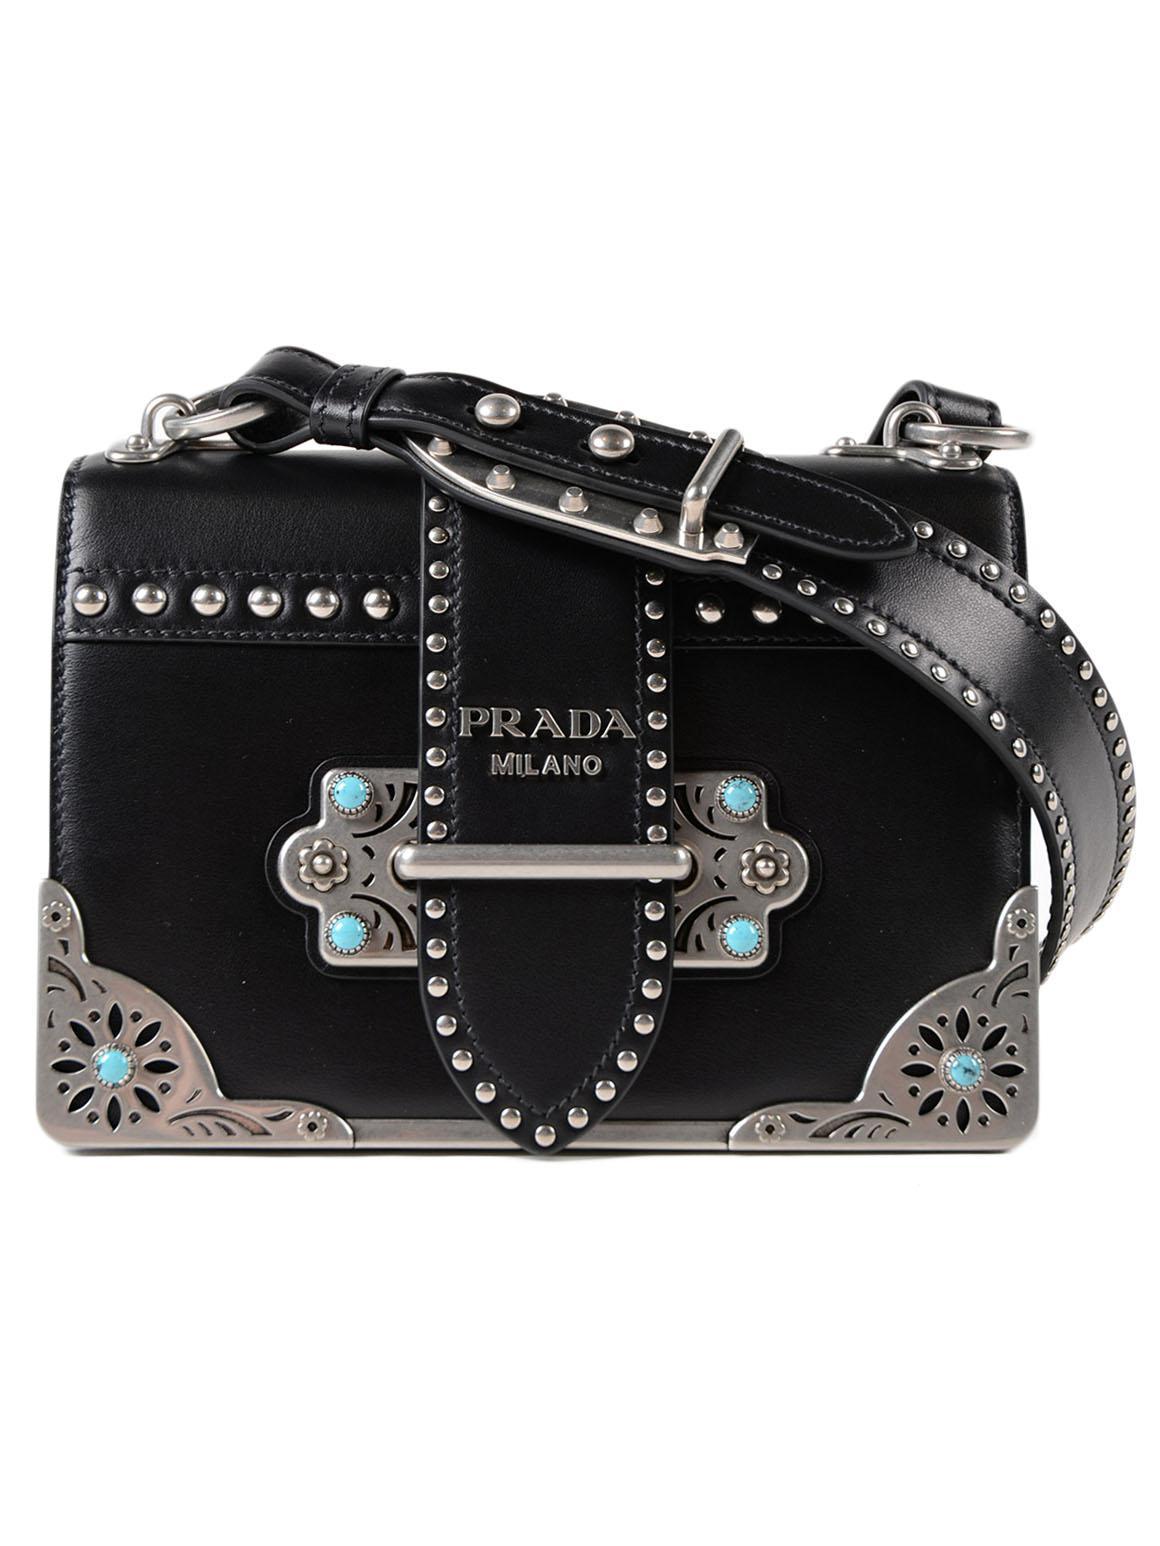 Prada City Calf Cahier Bag in Black - Lyst c0636f13a6d36